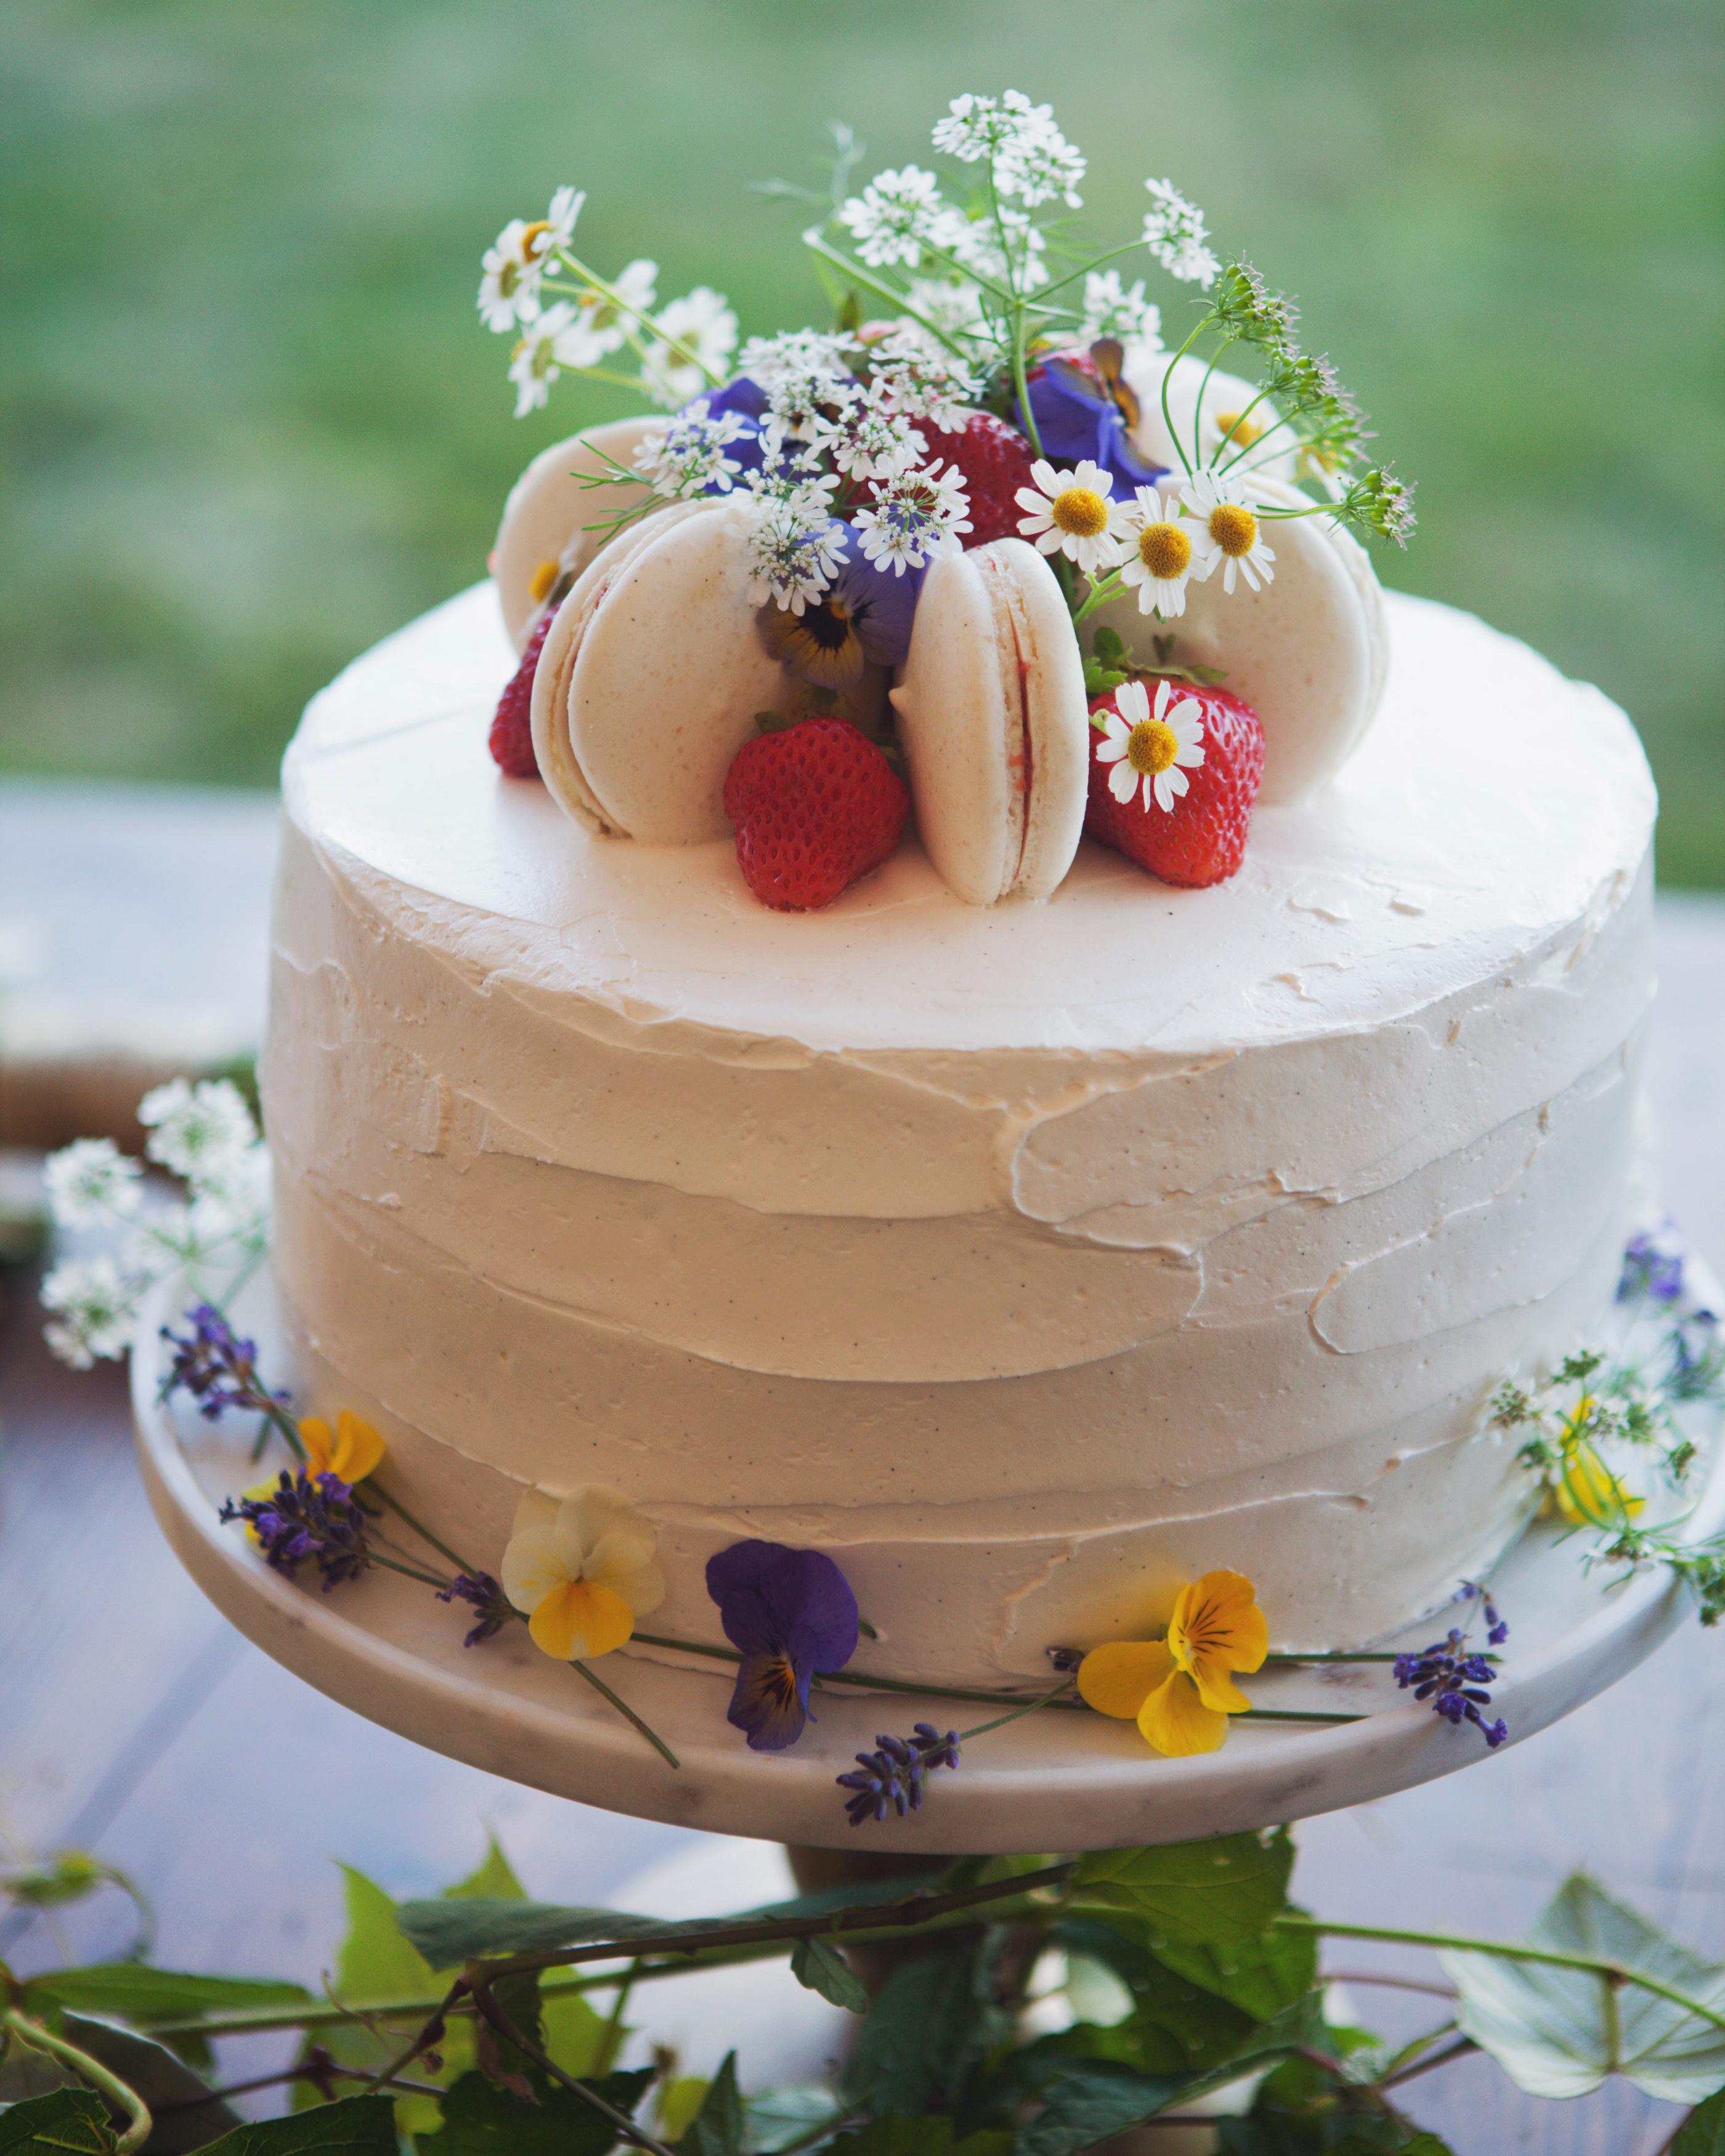 lilly-carter-wedding-cake-00549-s112037-0715..jpg